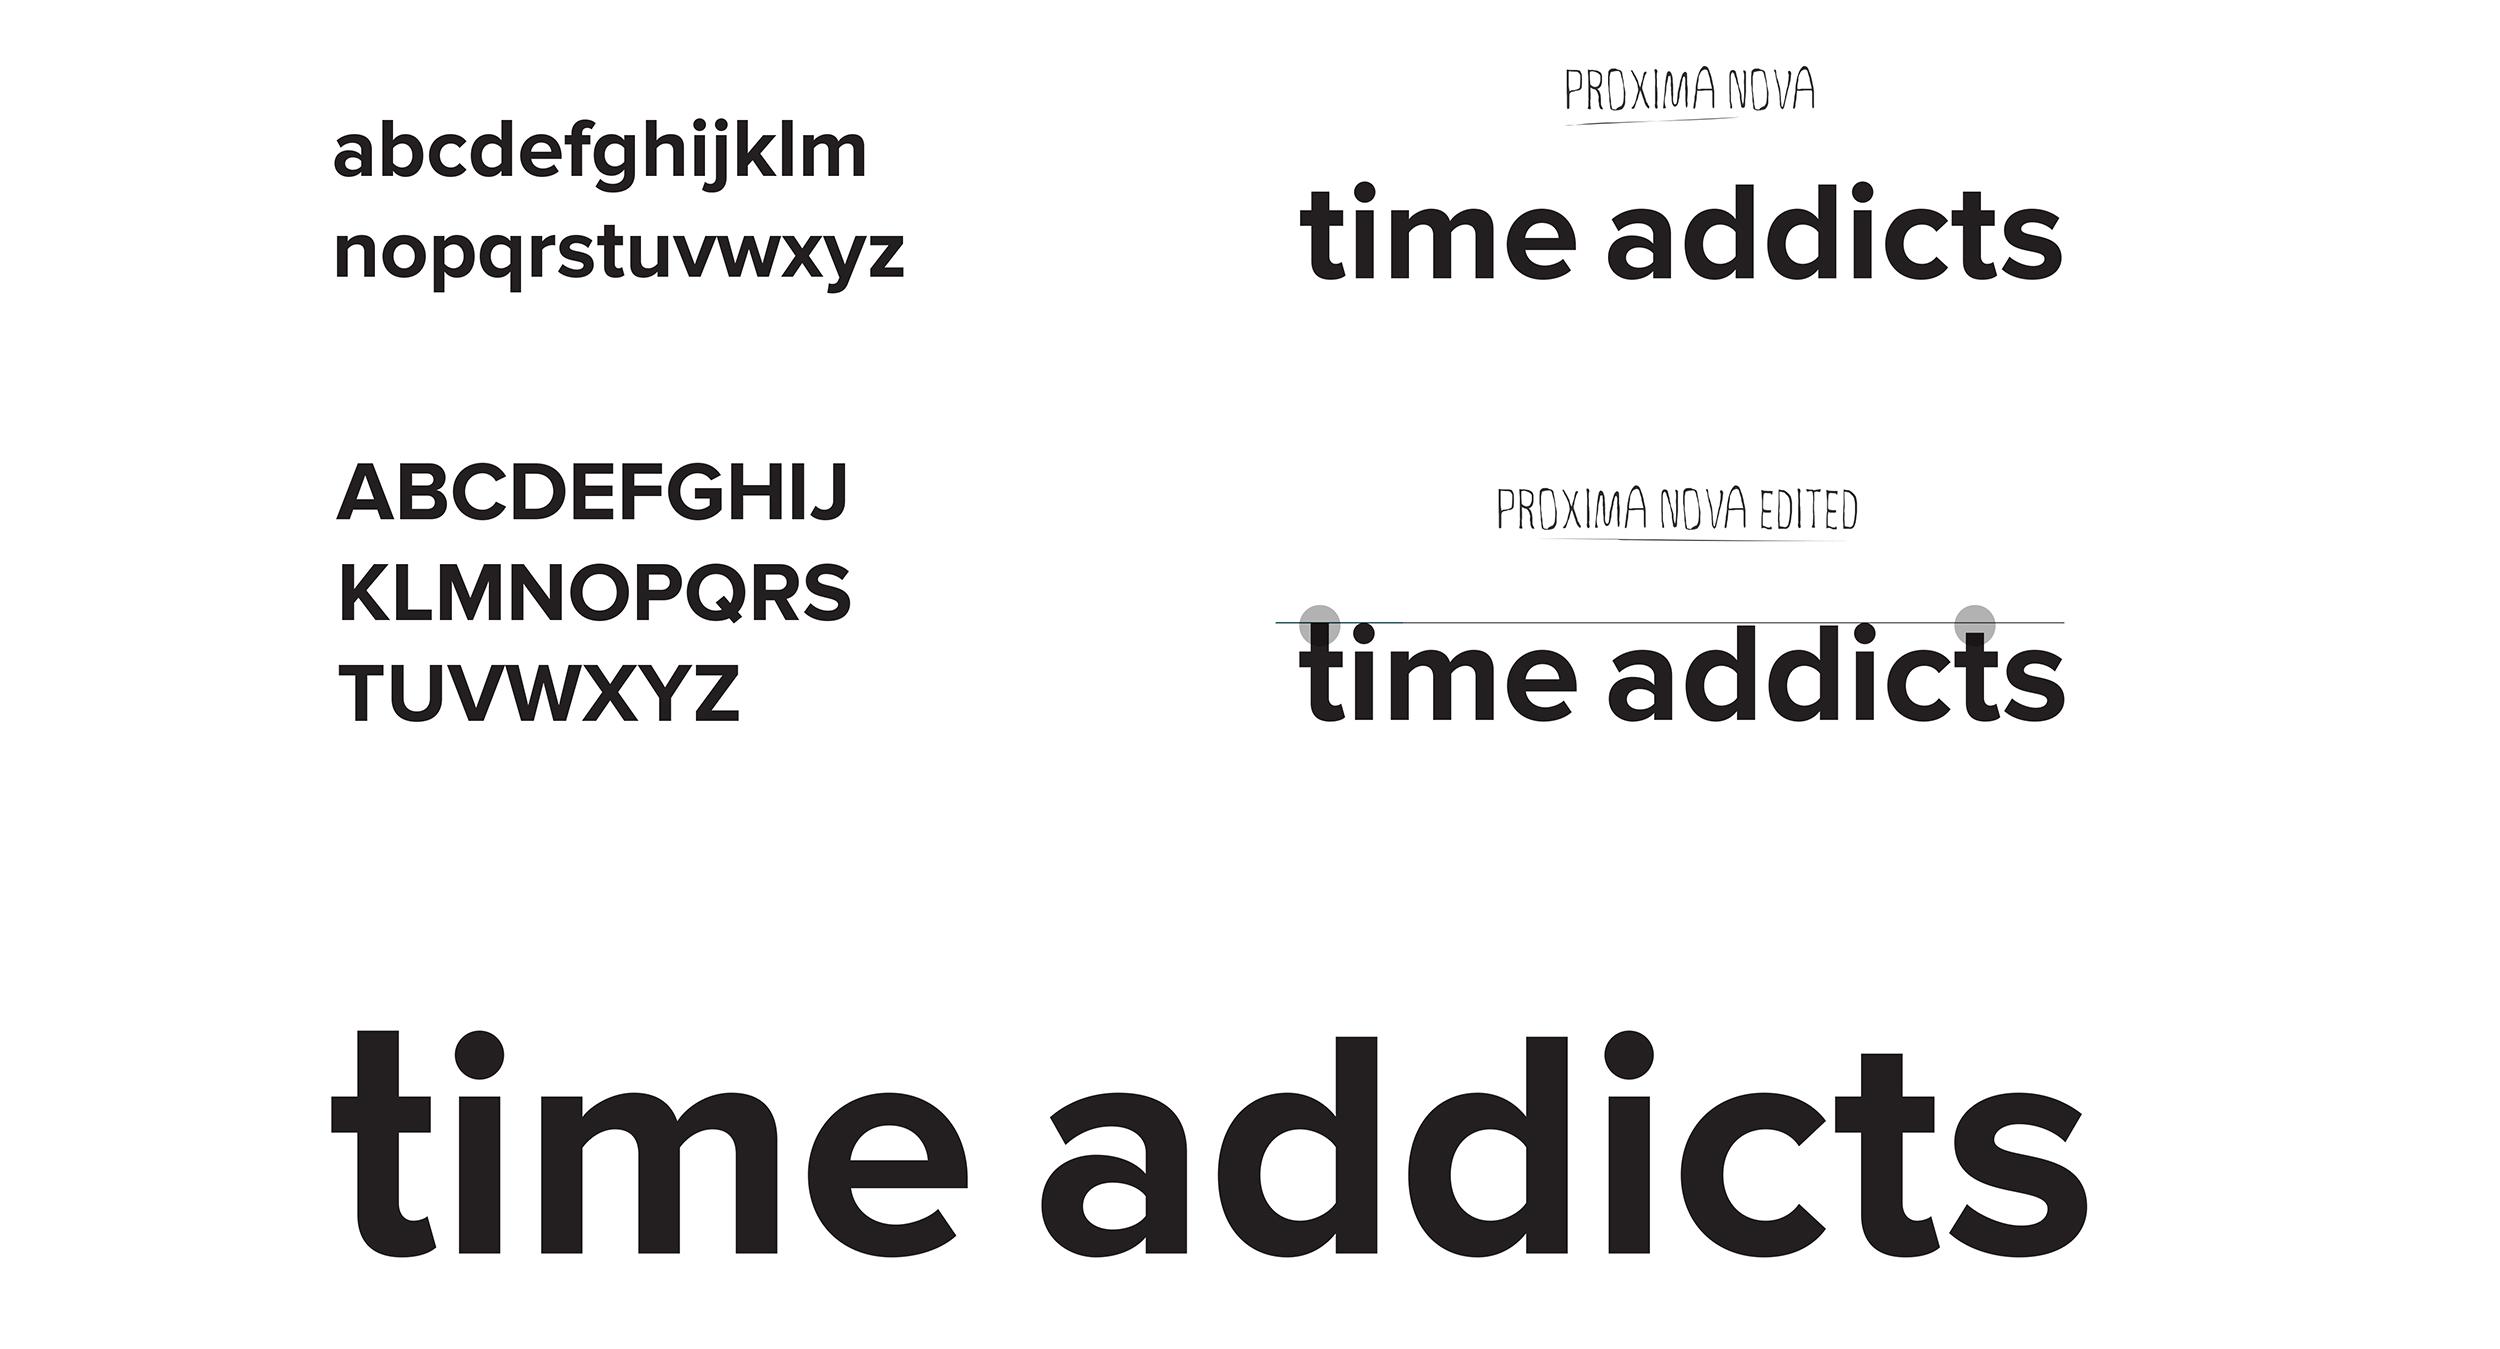 TIMEADDICTS011